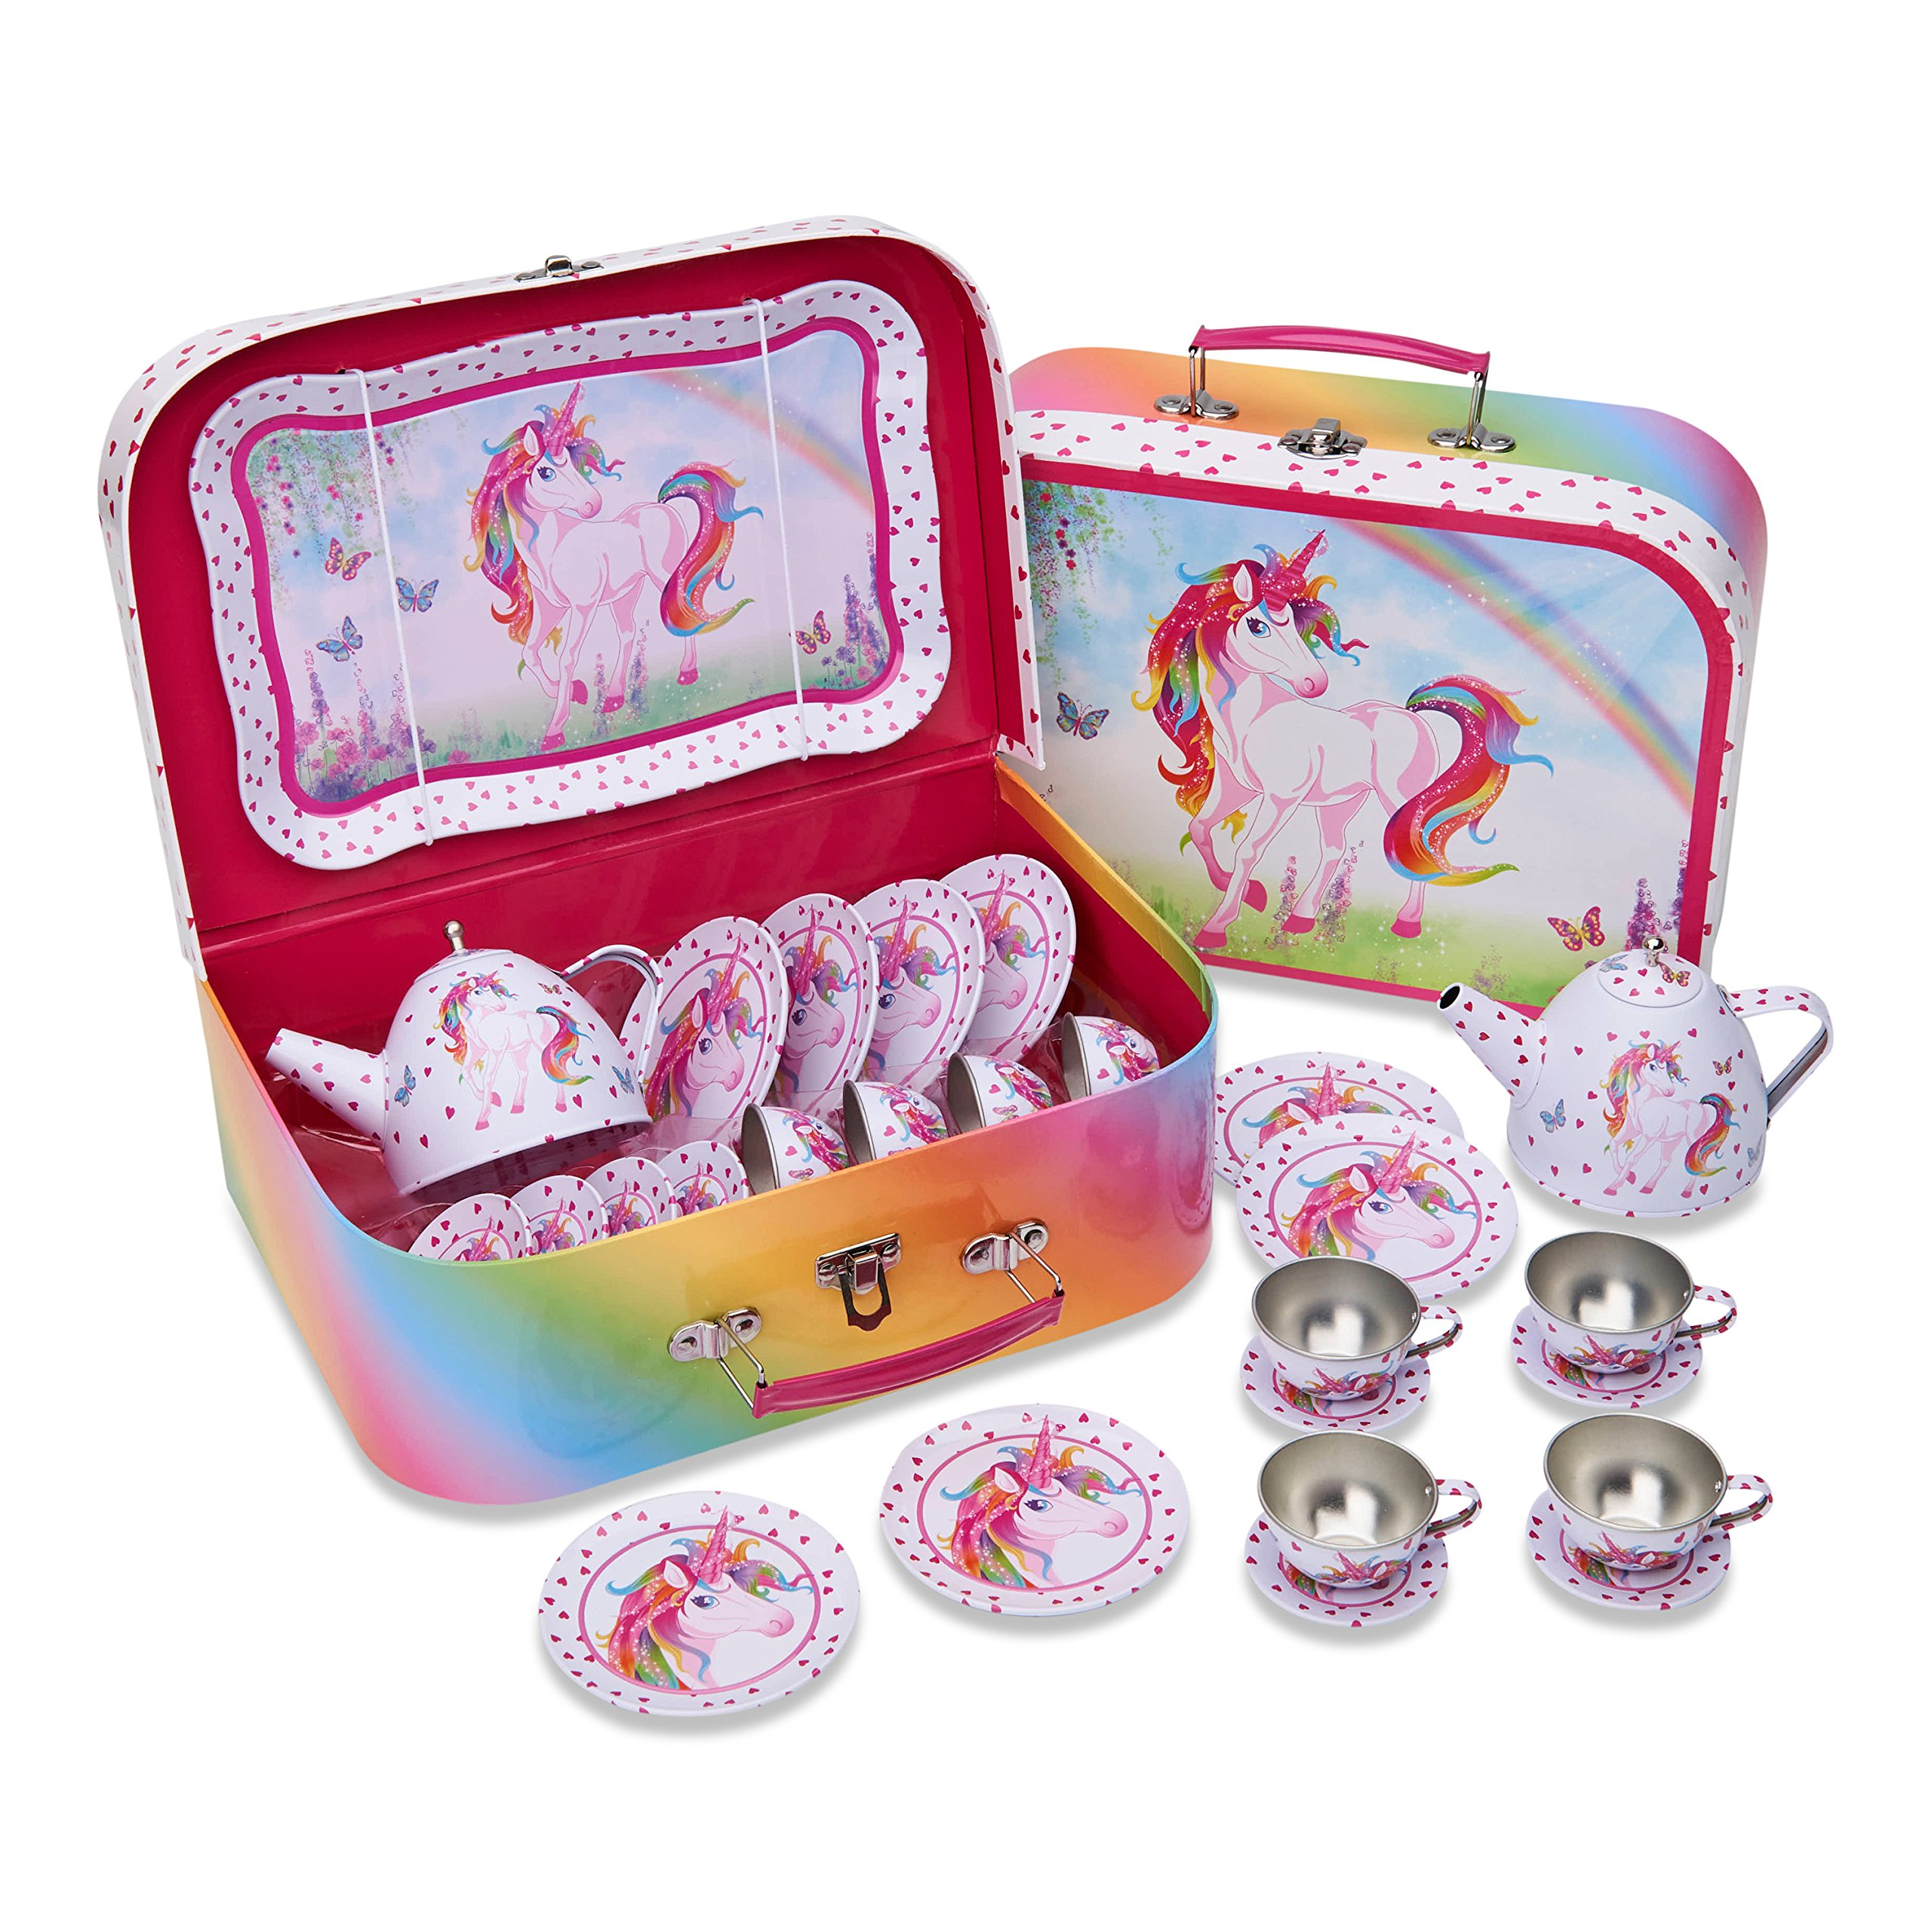 Lucy Locket Magical Unicorn Kids Tin Tea Set & Carry Case (14 Piece Tea Set for Kids)